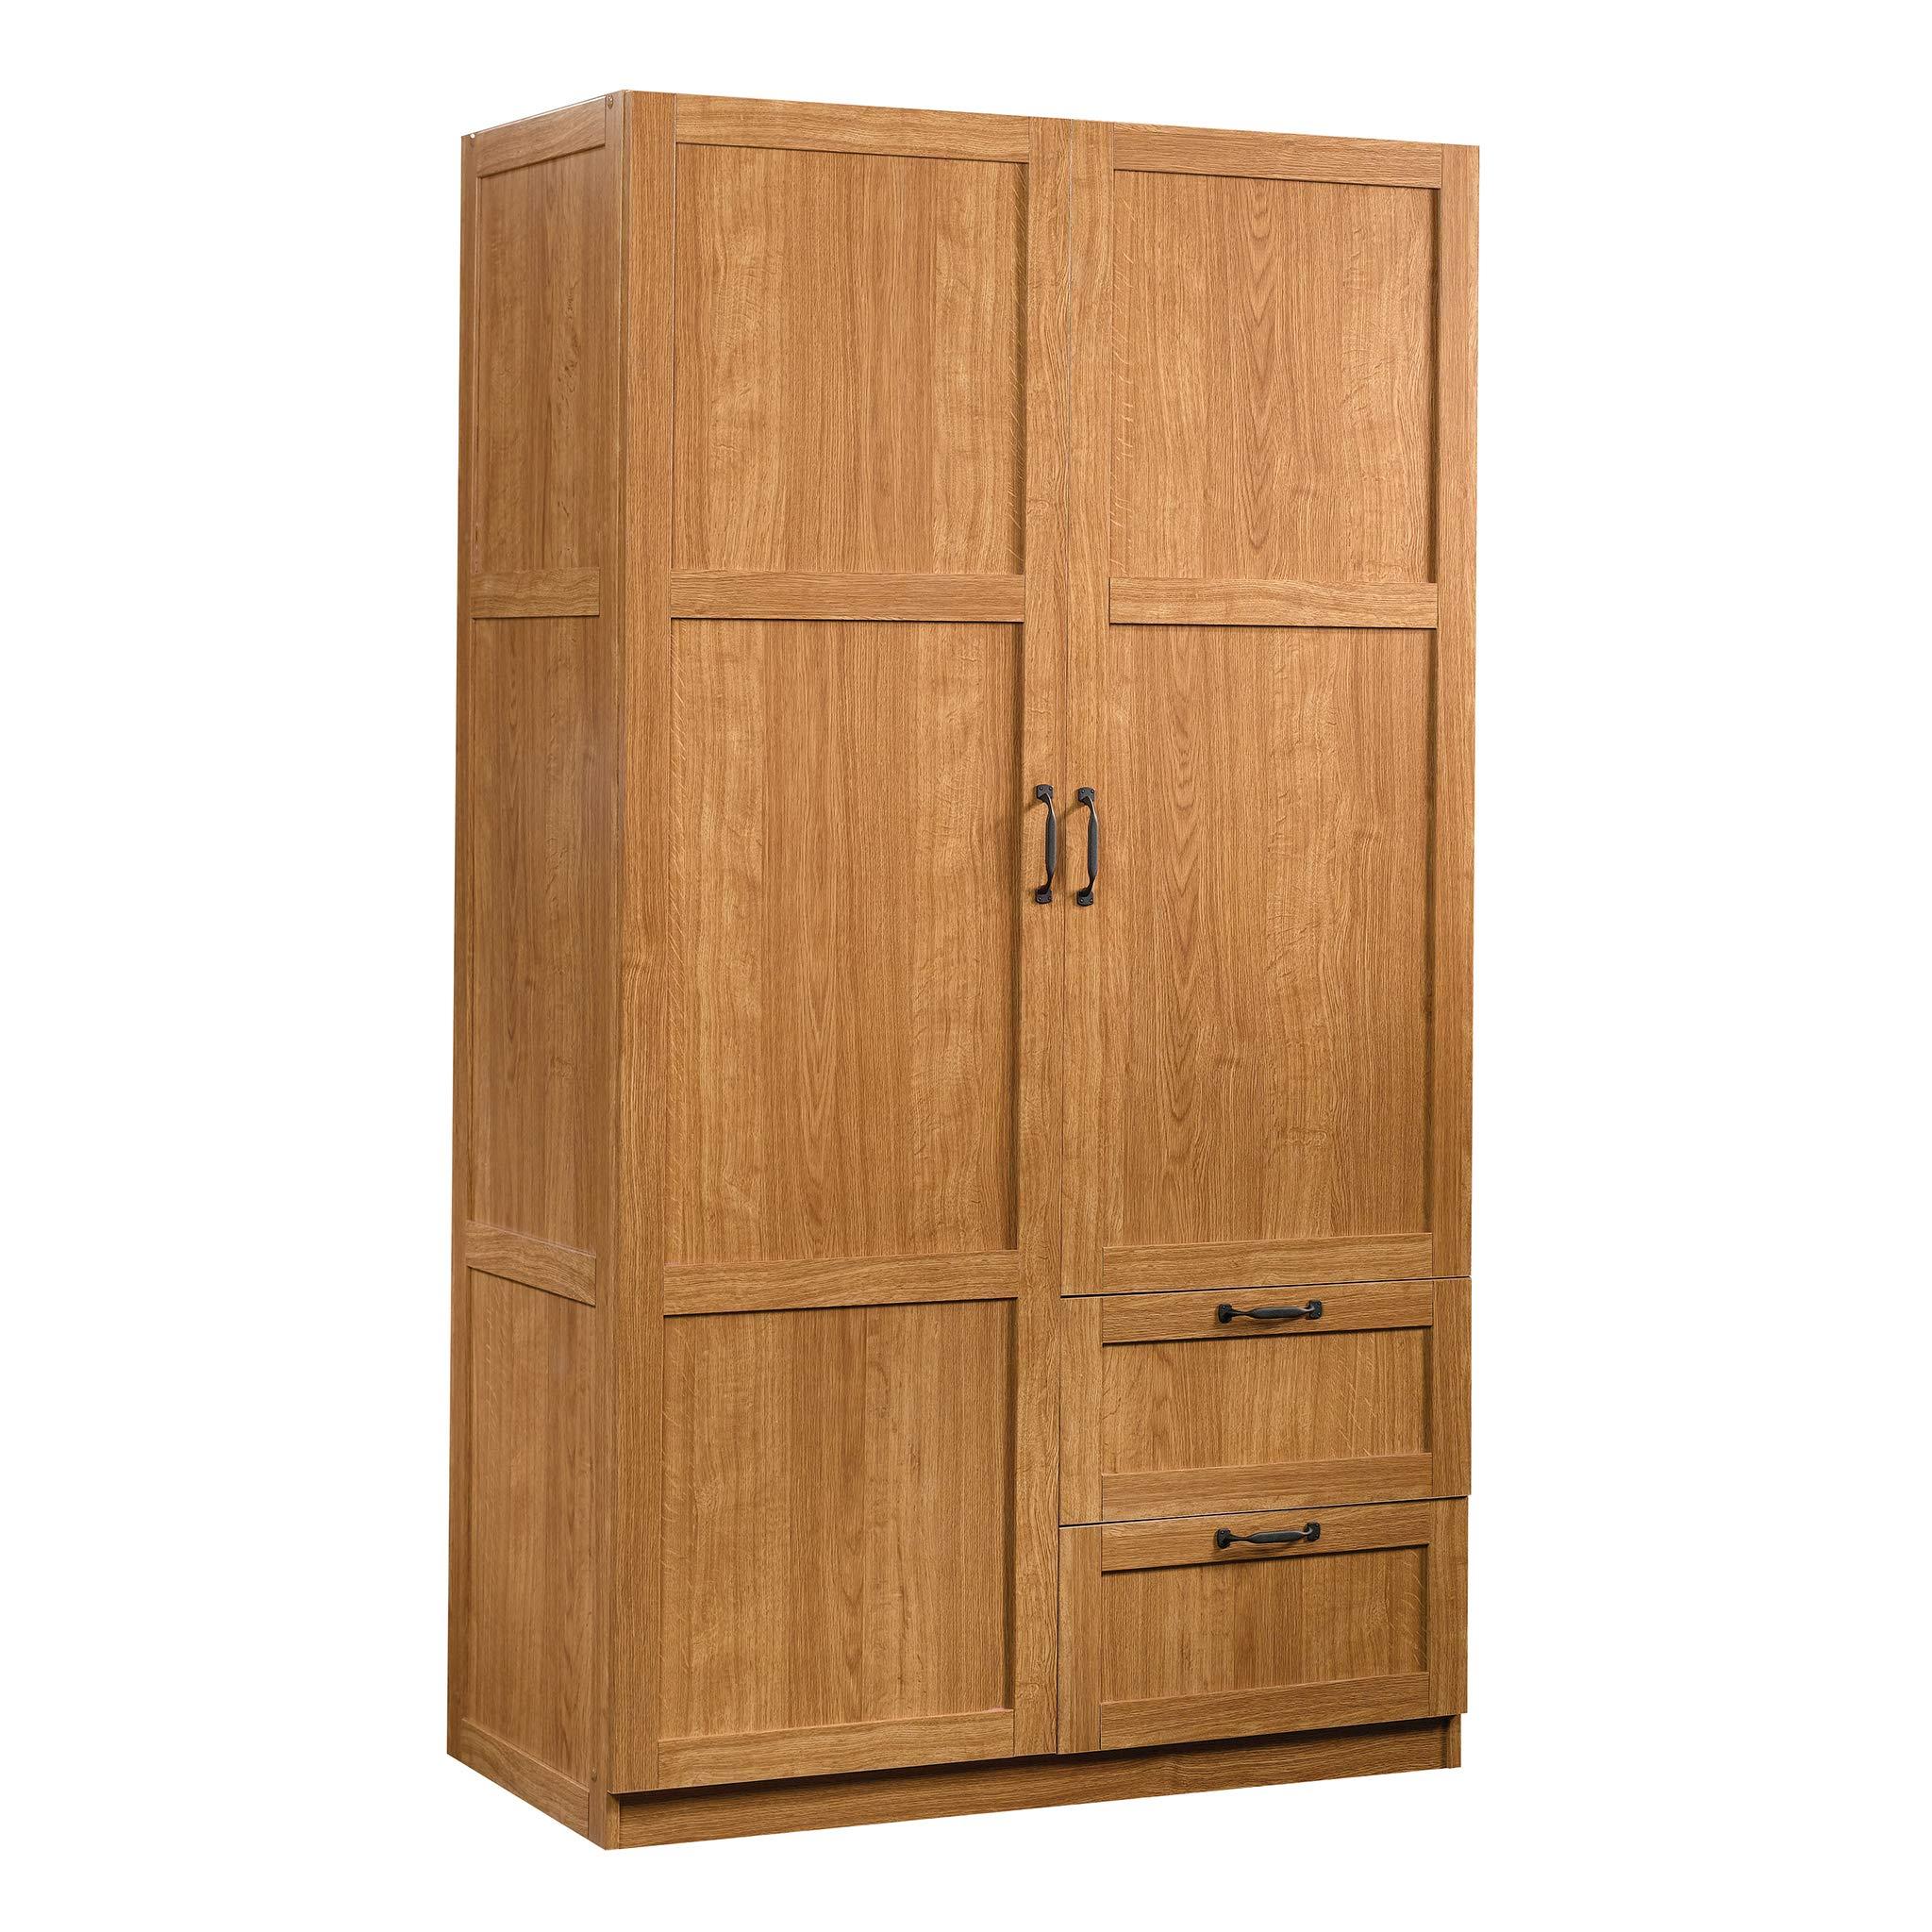 Sauder 420063 Miscellaneous Storage Cabinet, L: 40.00'' x W: 19.45'' x H: 71.10'', Highland Oak Finish